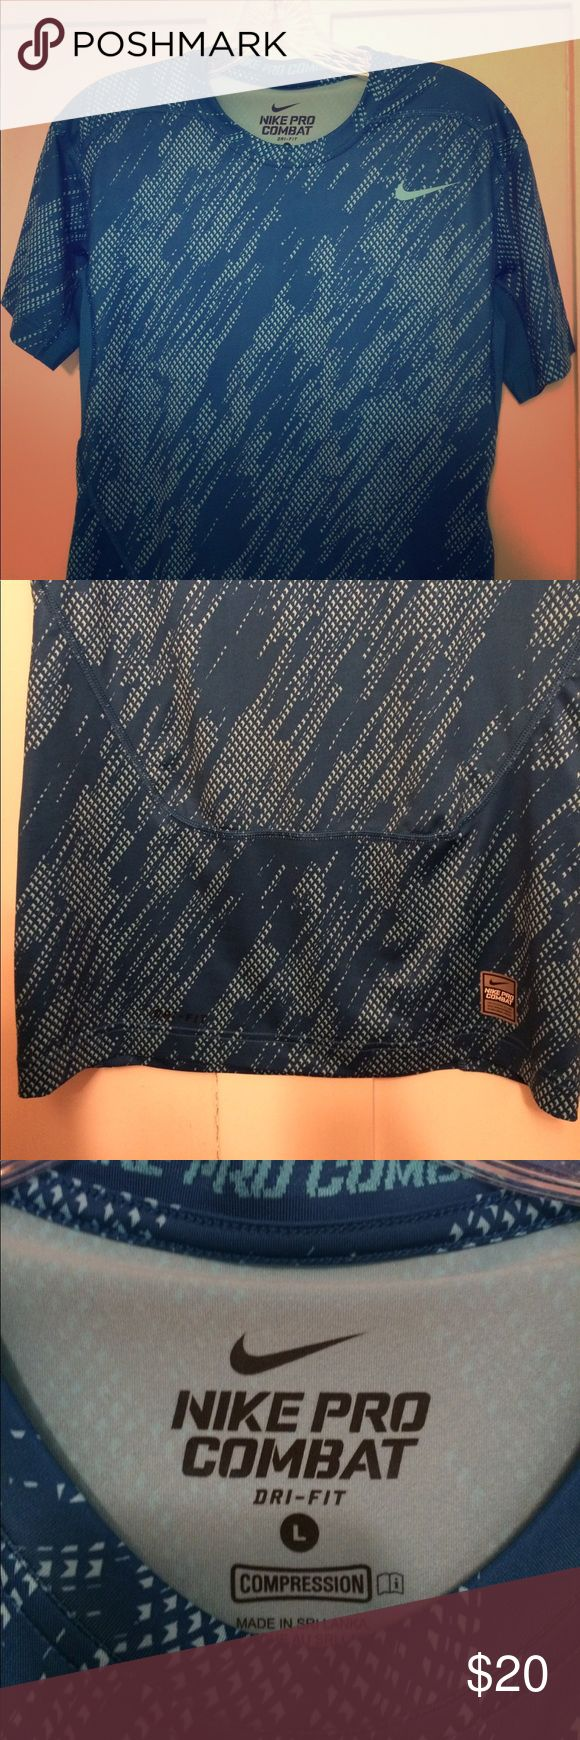 Nike Pro Combat Tee The Dri-fit material that wicks away moisture. Nike Shirts Tees - Short Sleeve